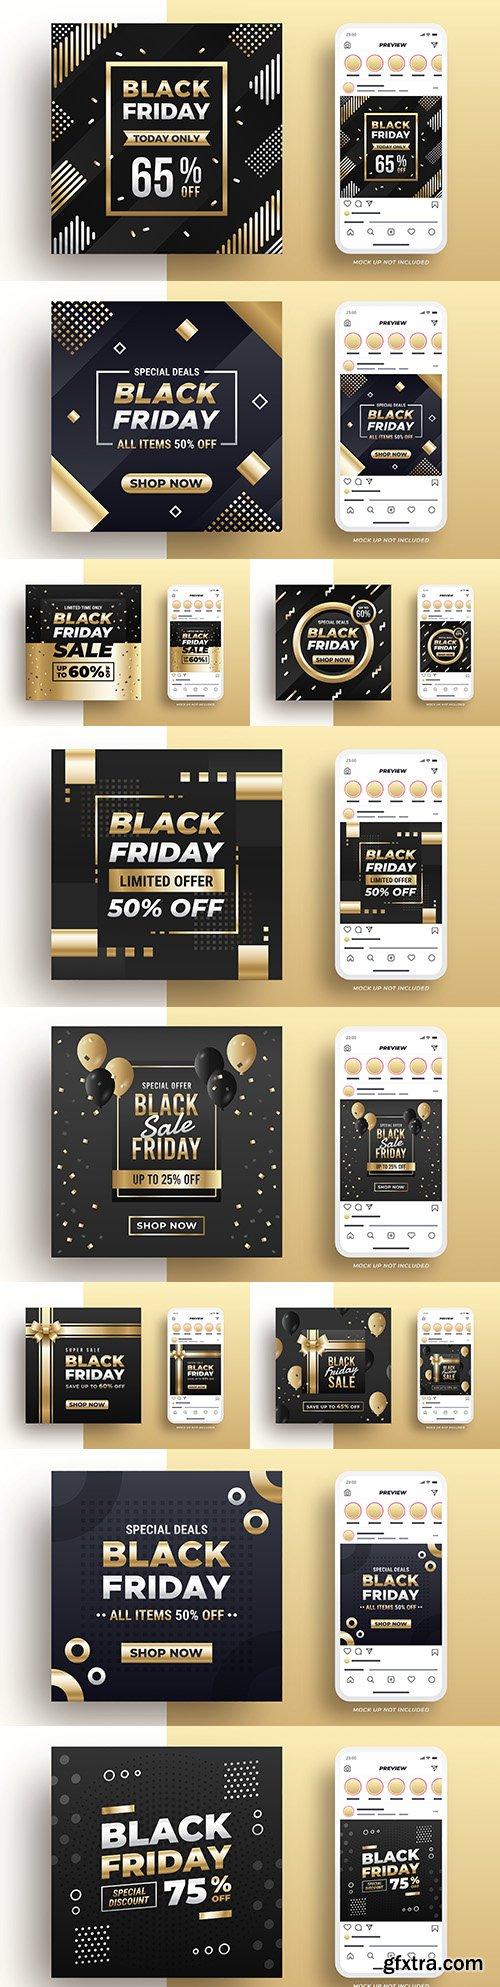 Black Friday selling banner on social media design gold